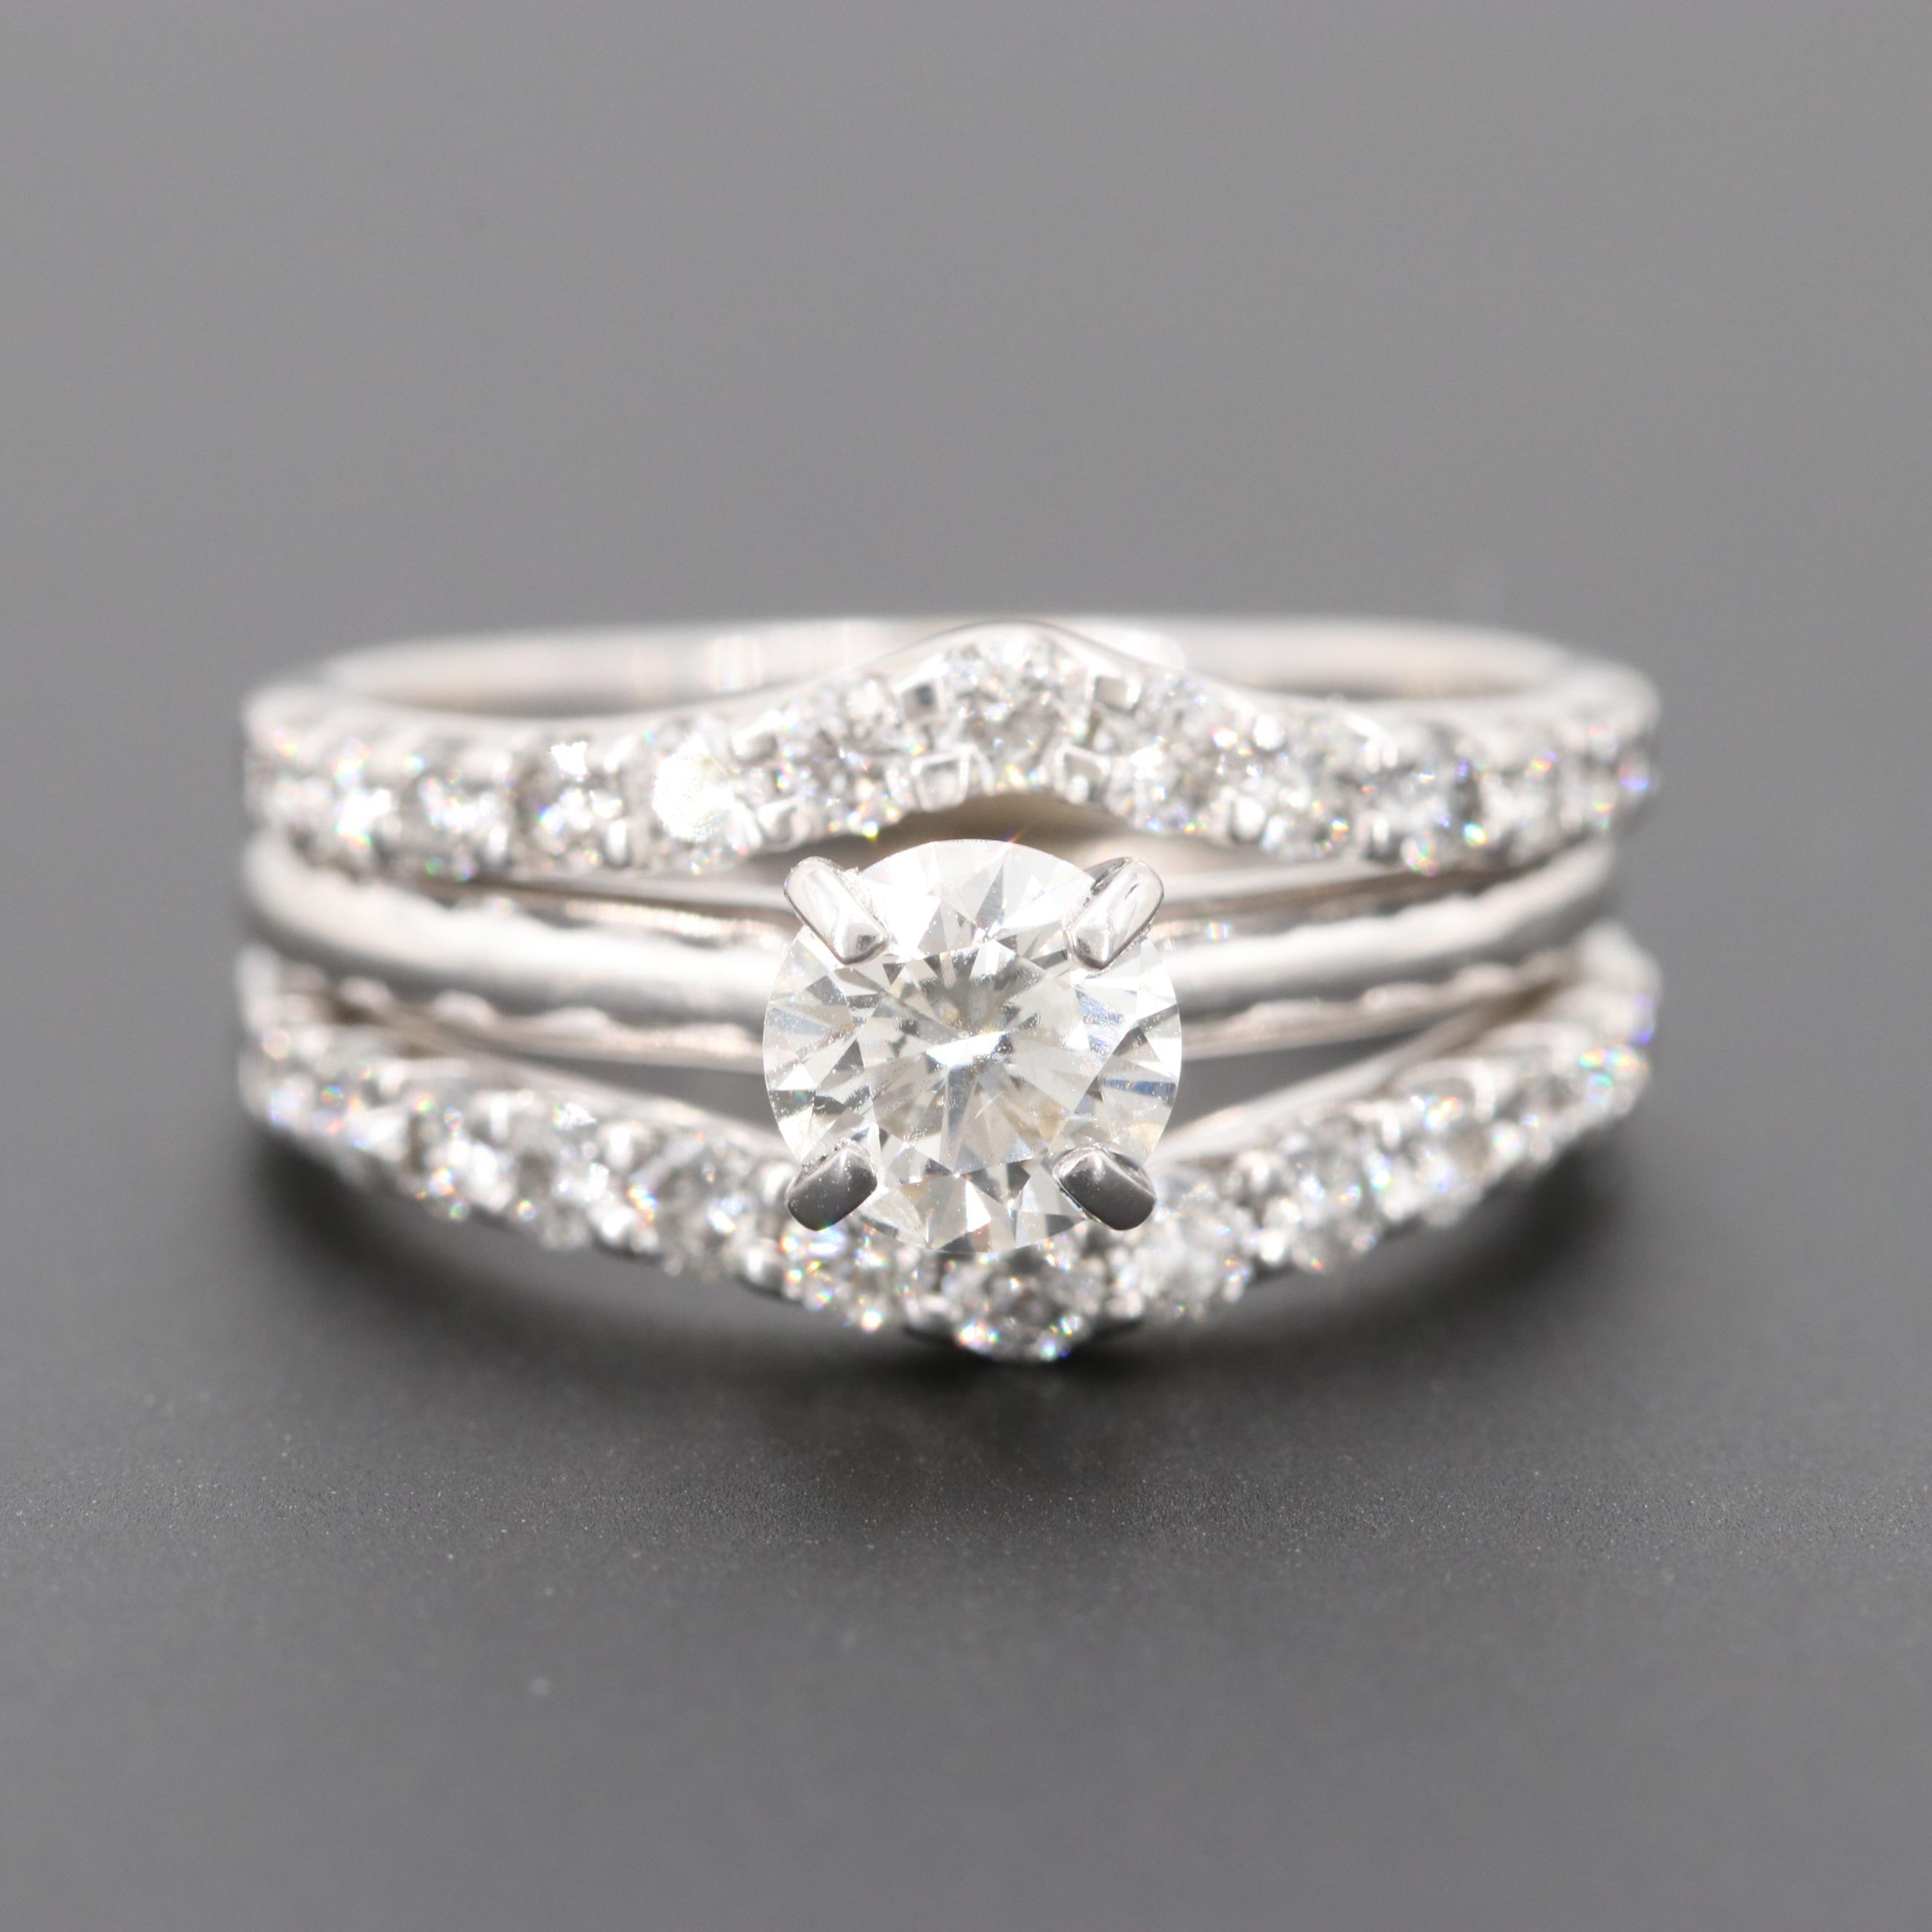 14K White Gold 1.61 CTW Diamond Ring